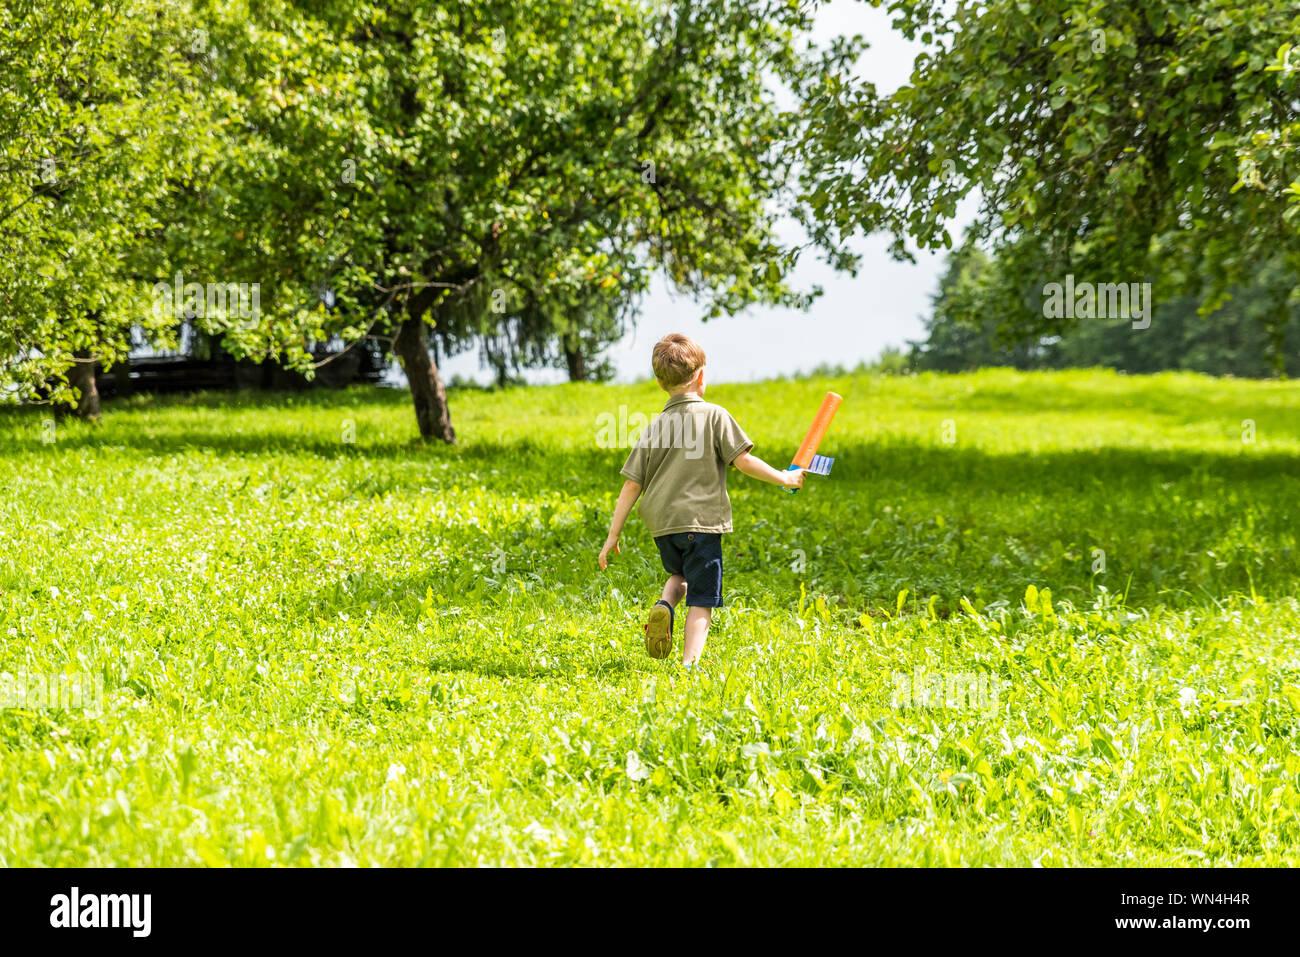 Rear View Of Boy Walking On Grass Stock Photo